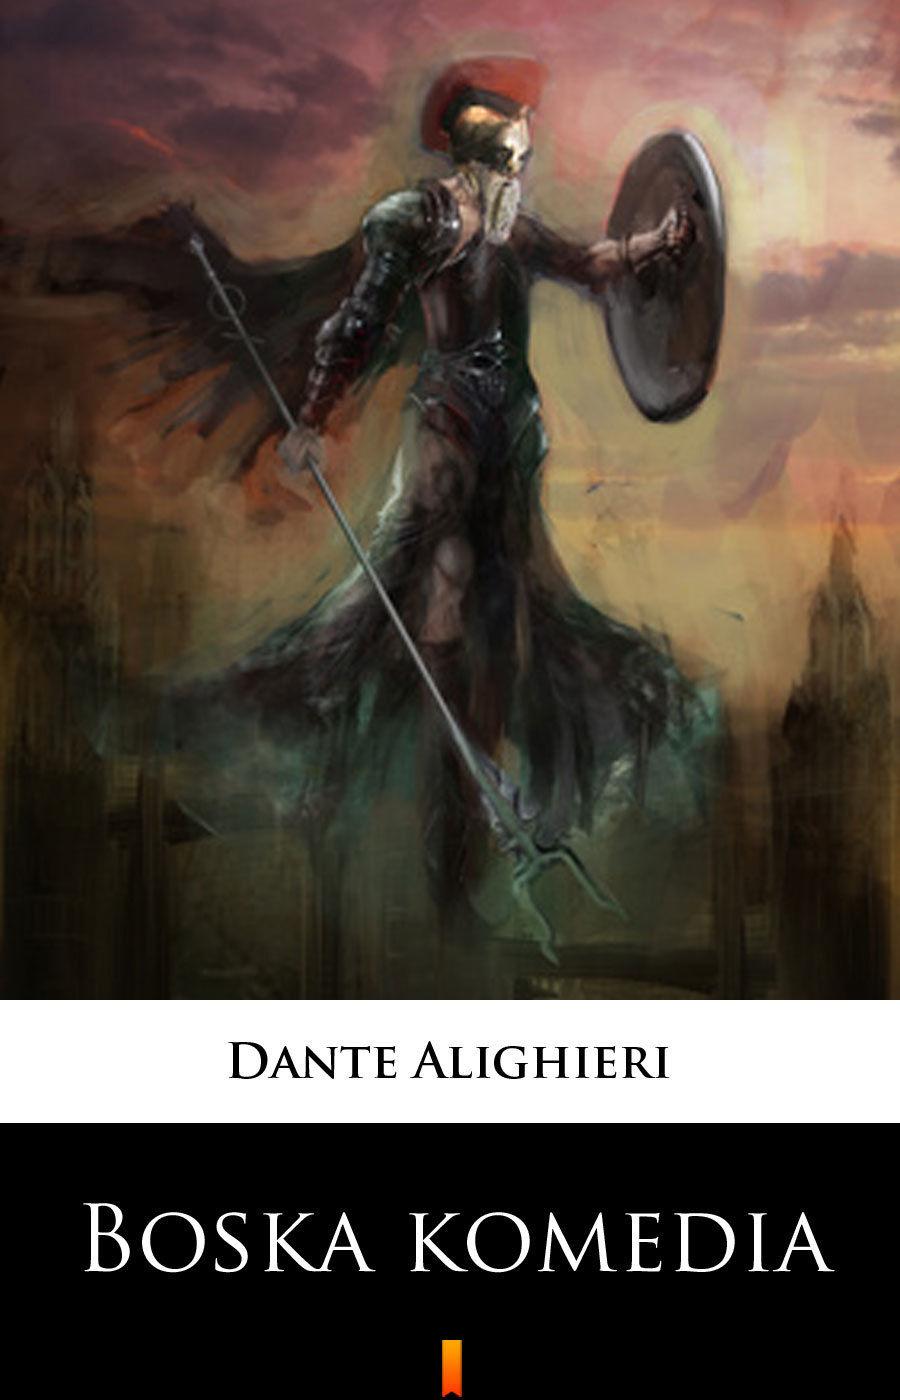 Boska komedia - Dante Alighieri - ebook